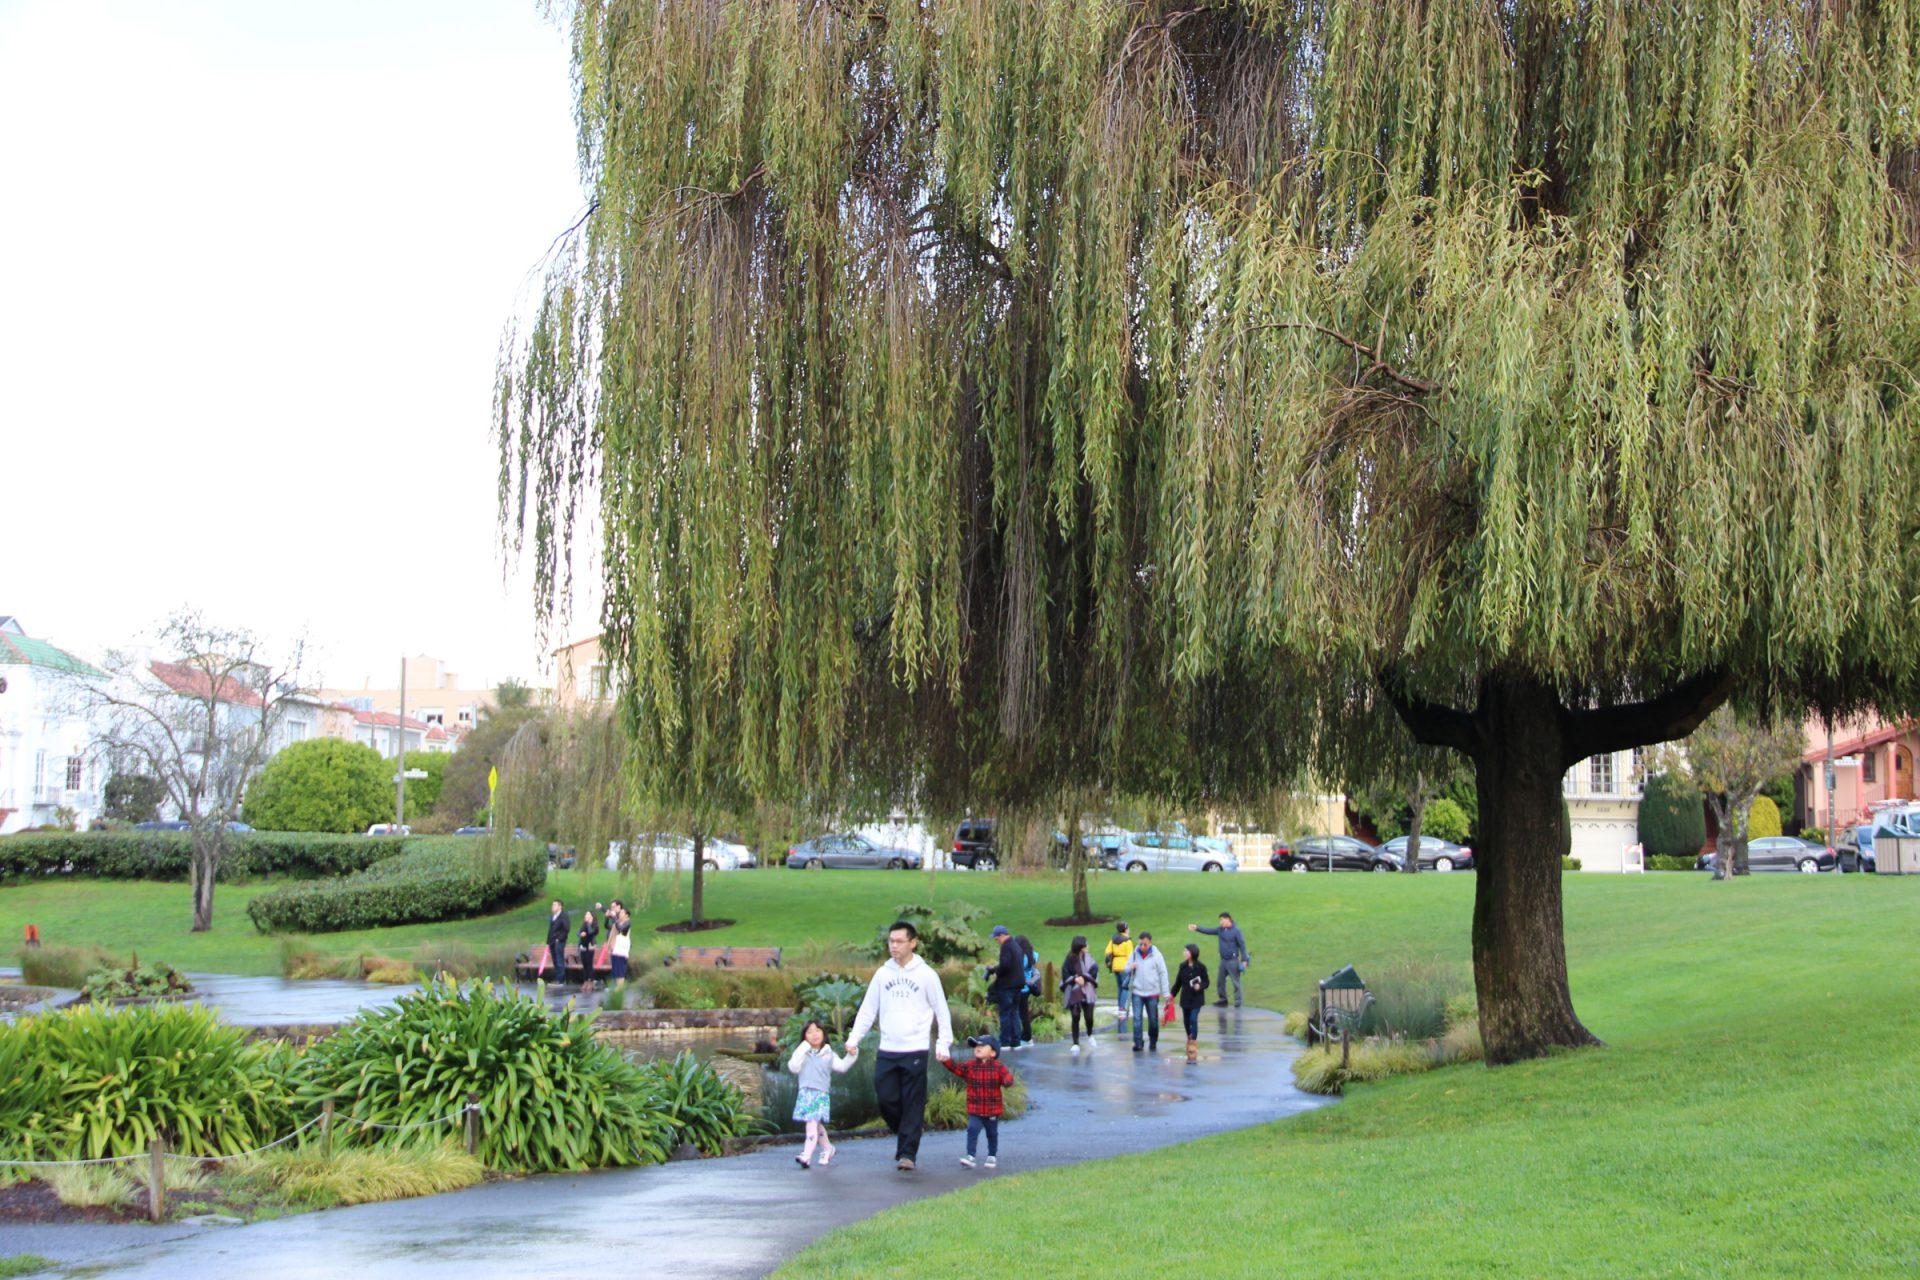 People Walk Through Park Under Willow Tree